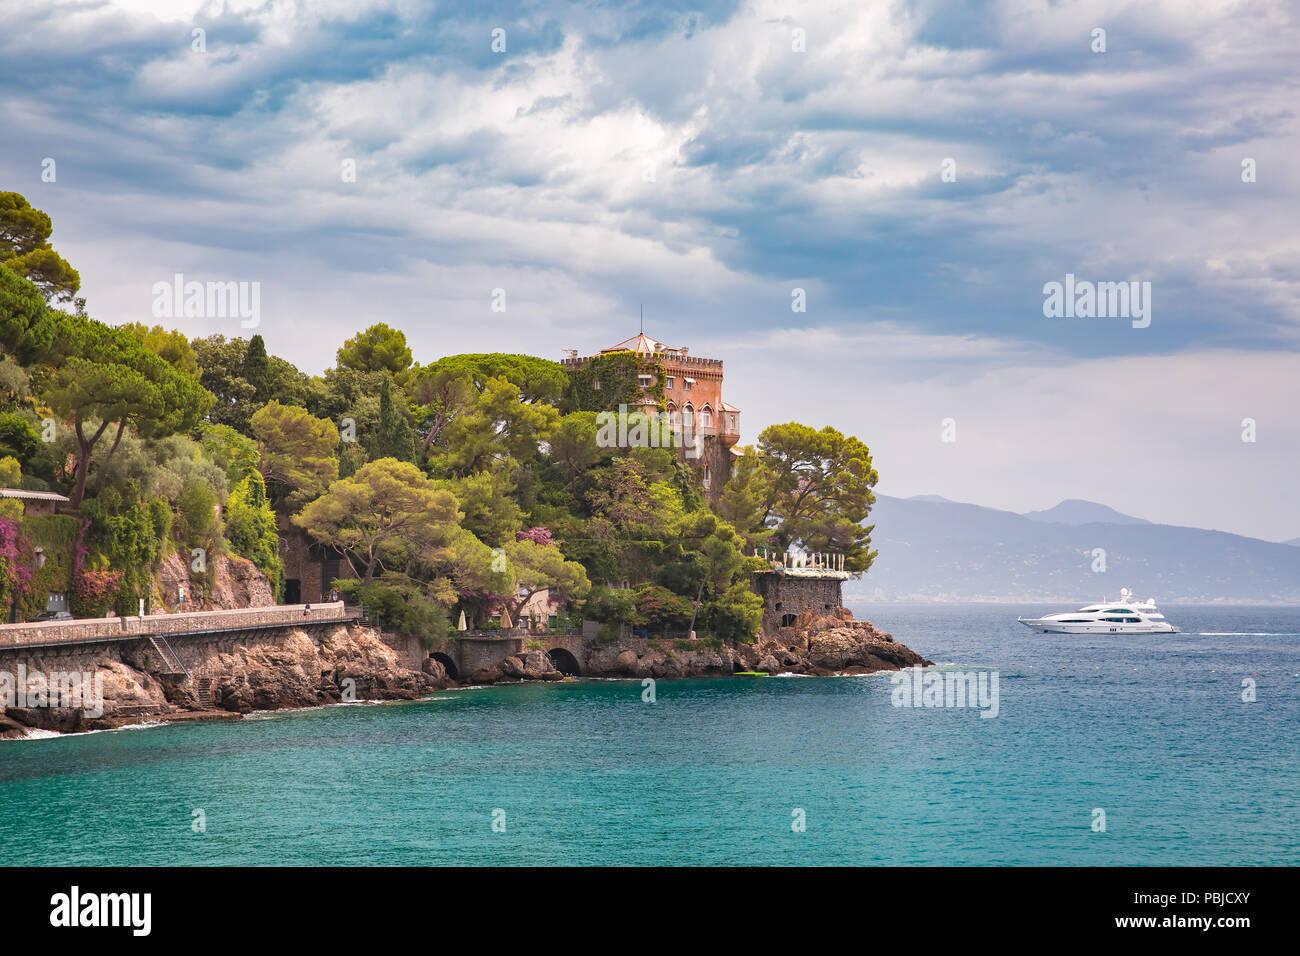 Seaview of Portofino, Italian Riviera, Liguria Stock Photo